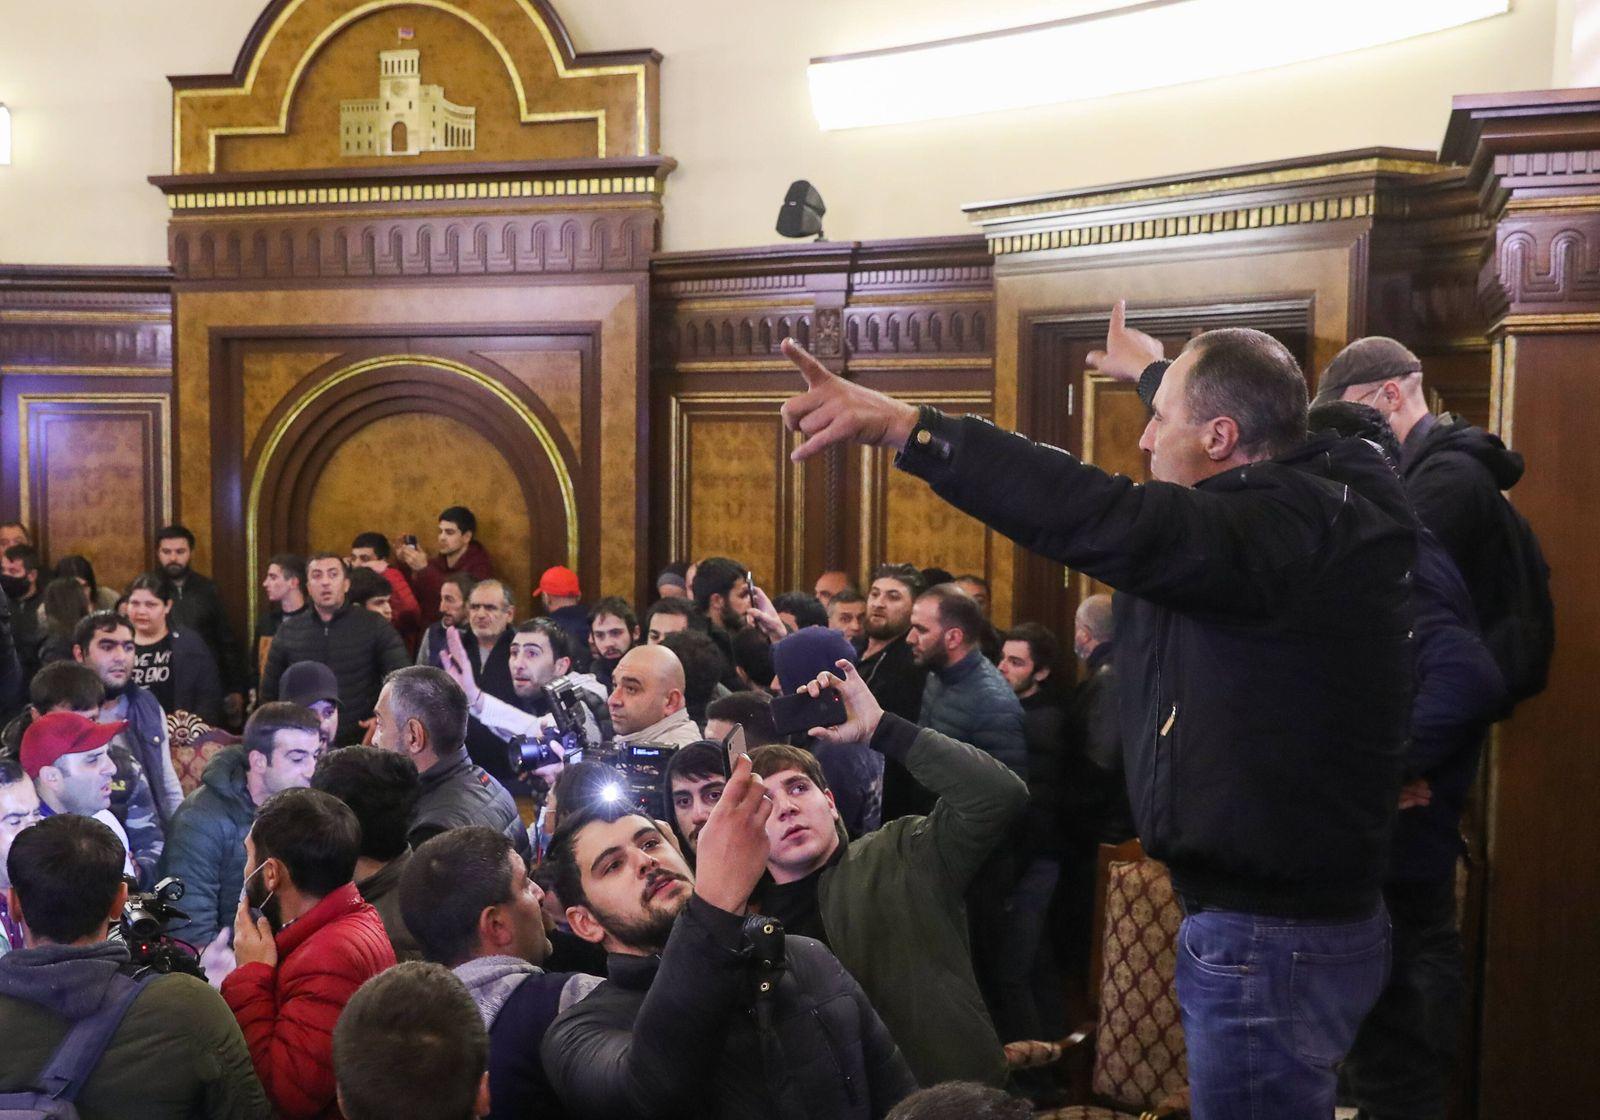 YEREVAN, ARMENIA - NOVEMBER 10, 2020: Demonstrators protesting against the end of war in Nagorno Karabakh break into th